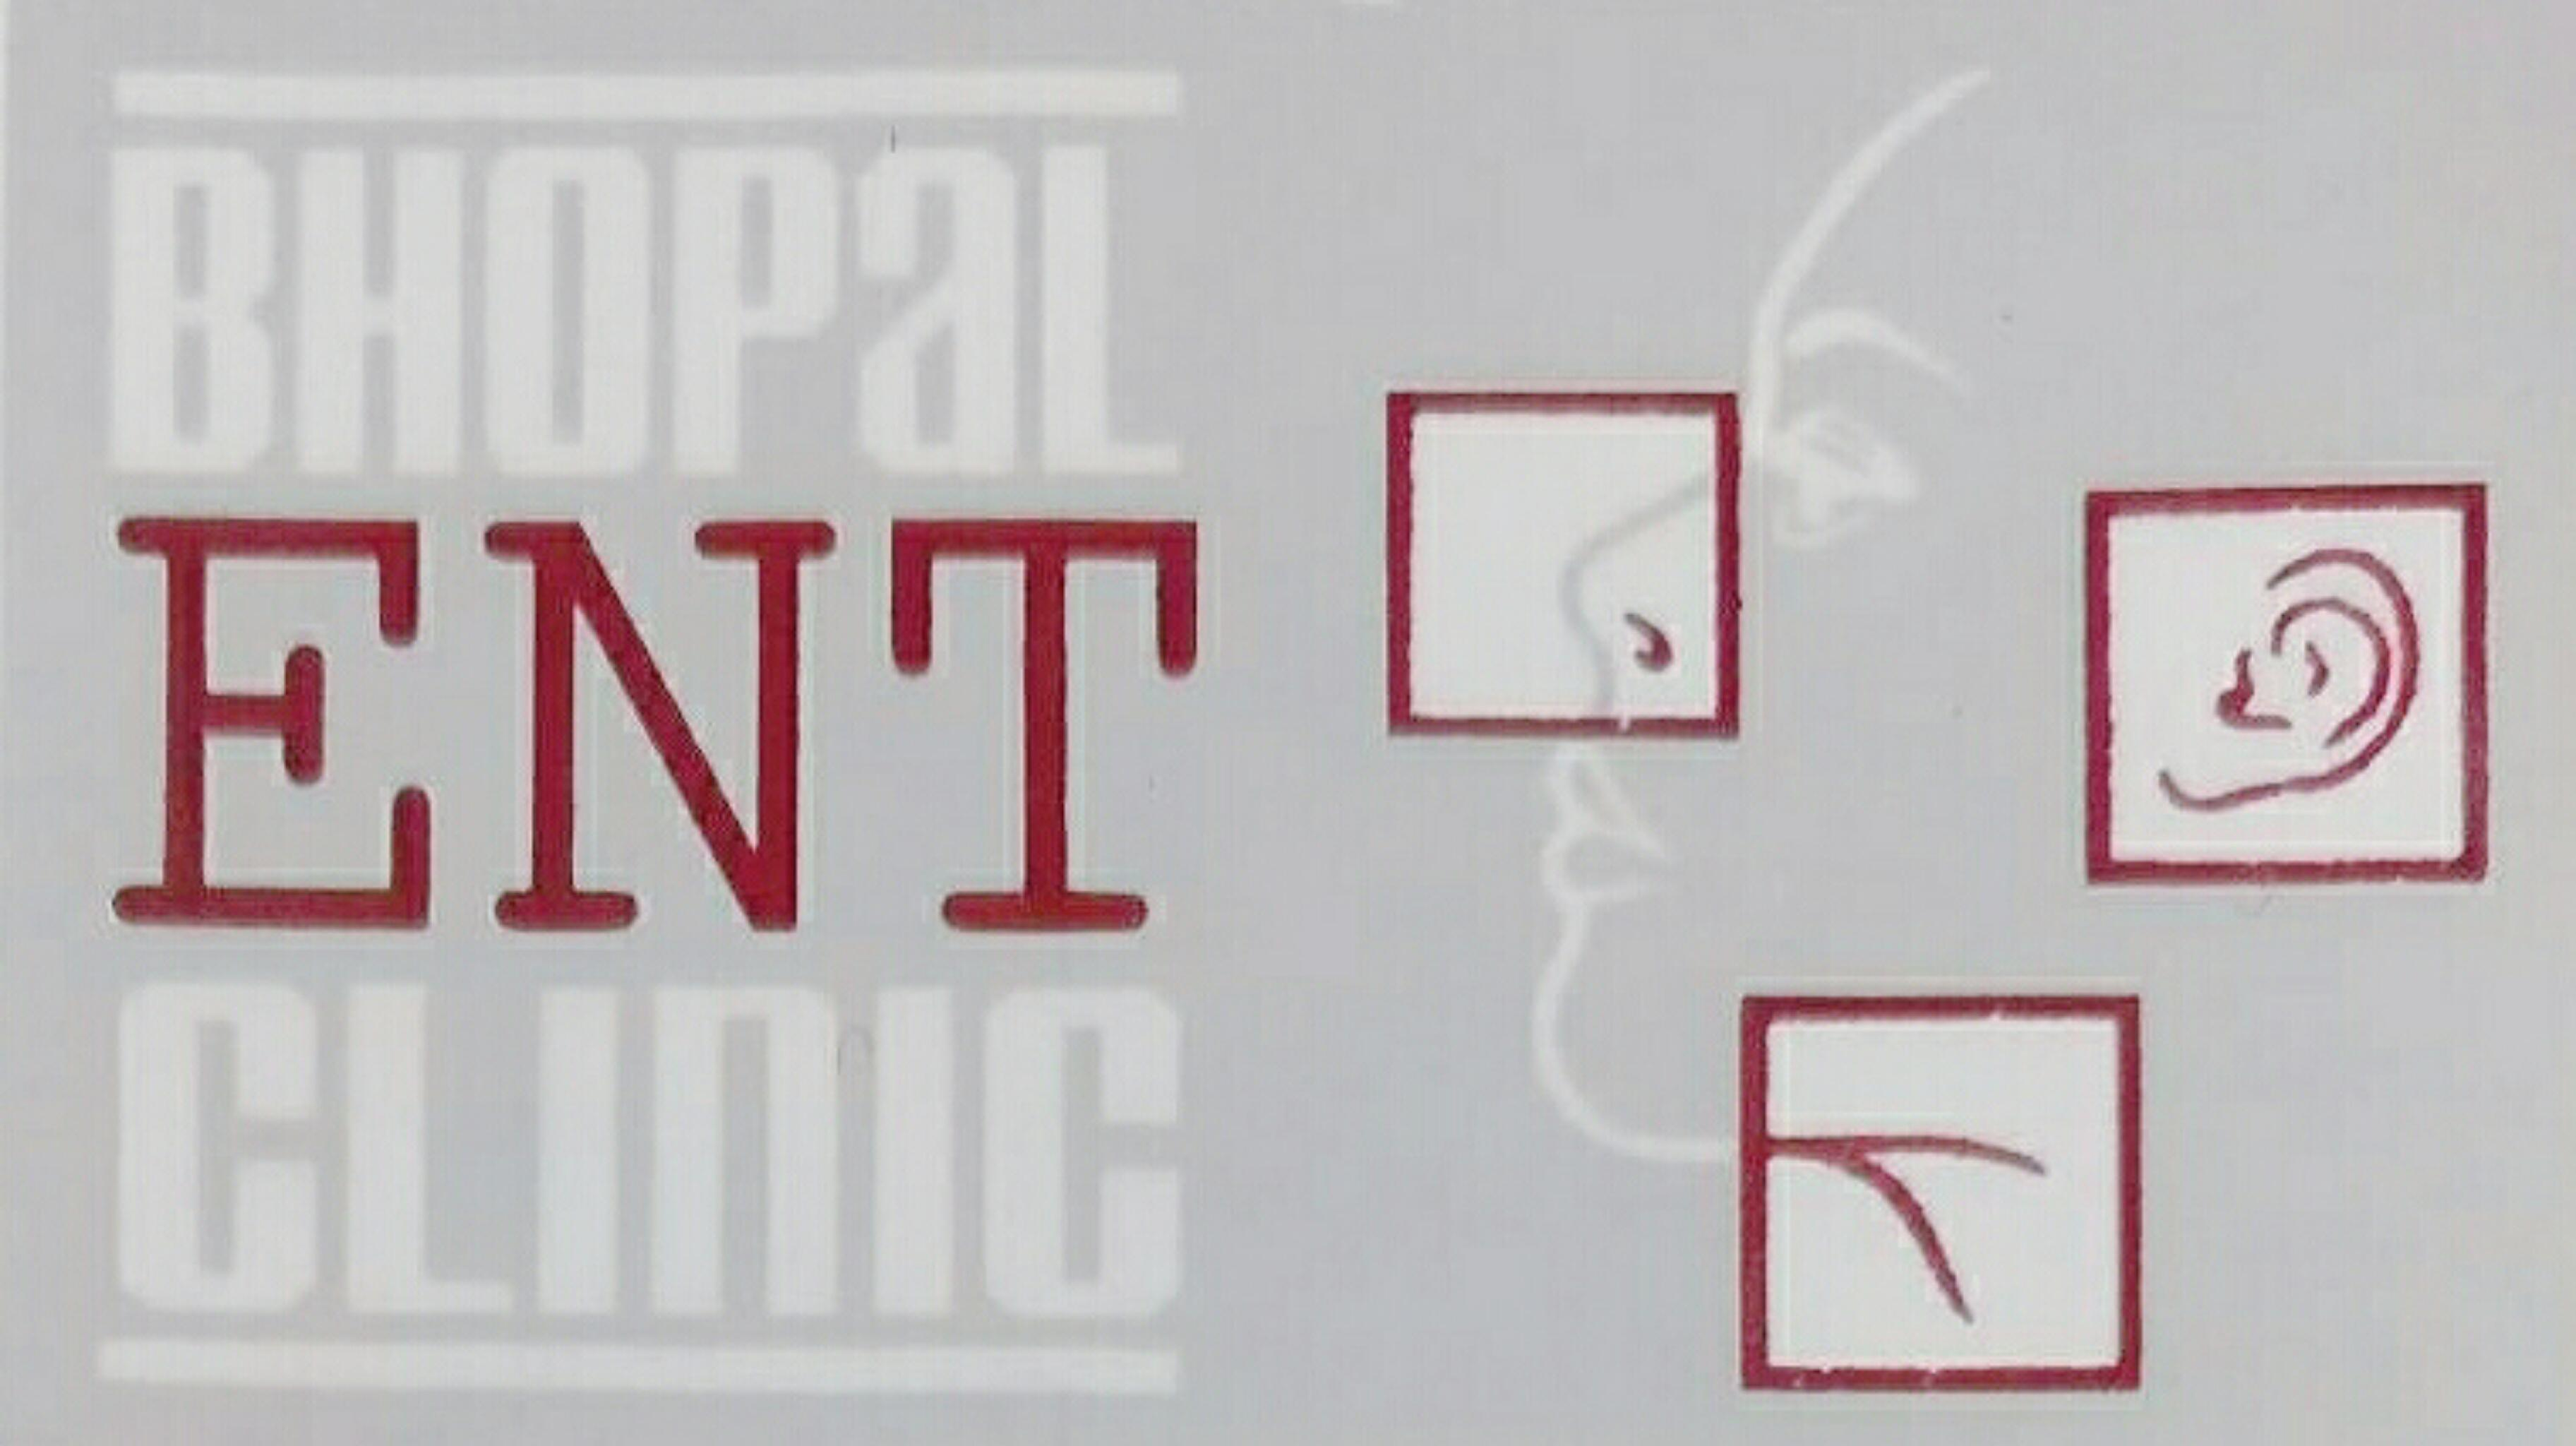 Bhopal ENT Clinic